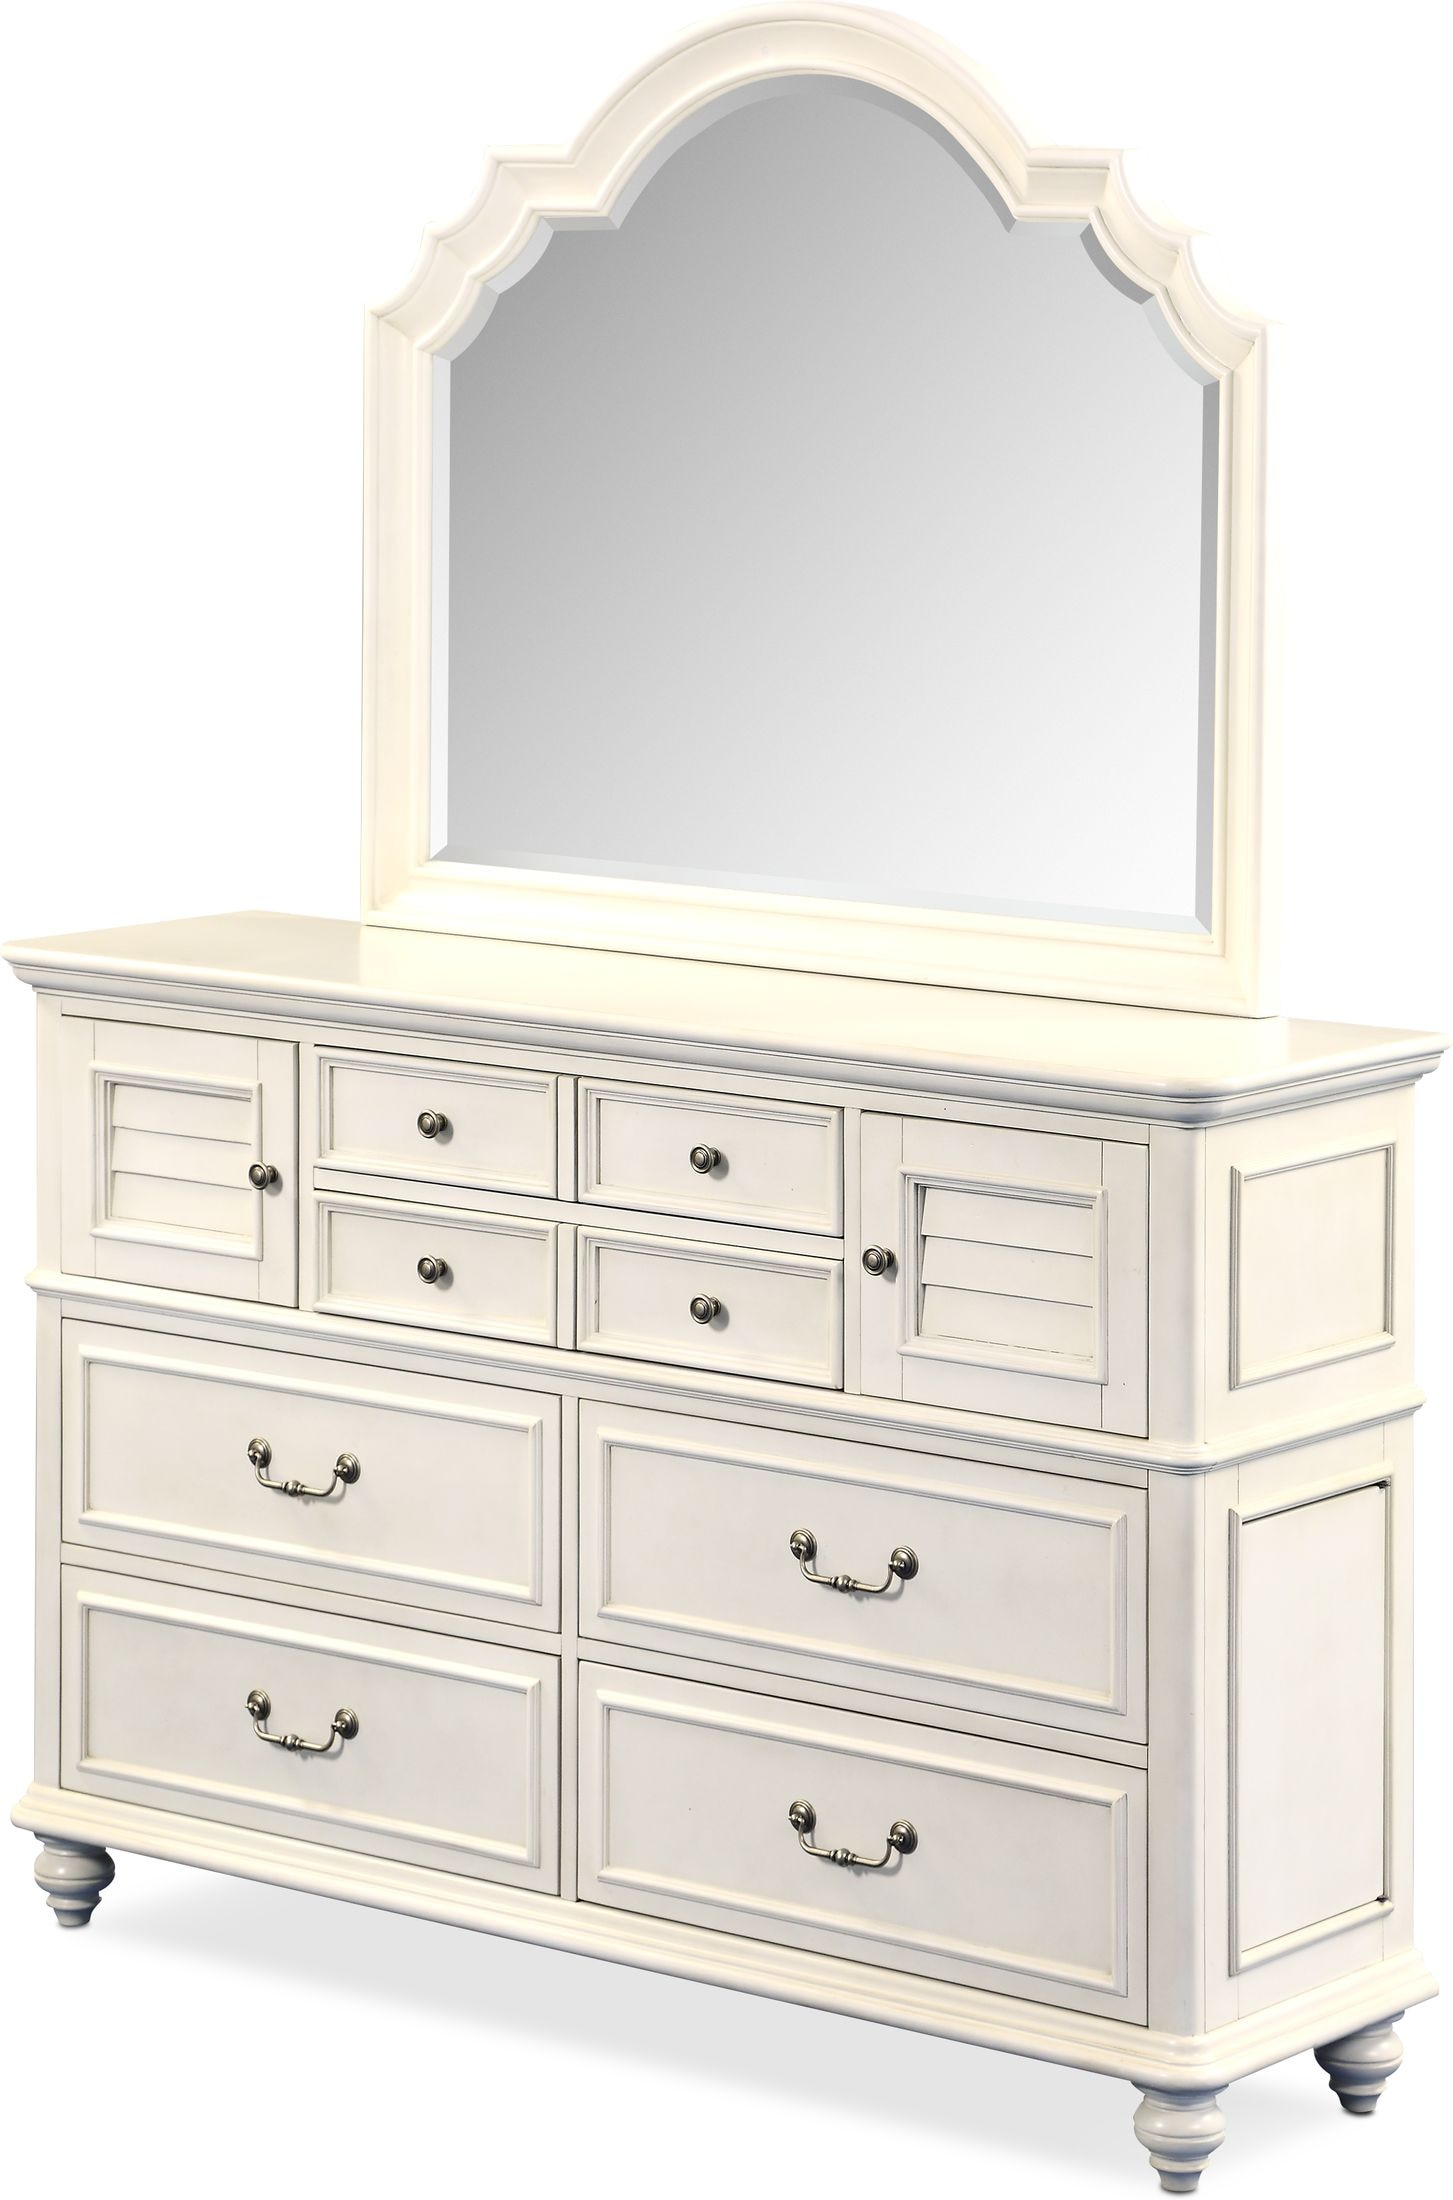 Charleston Dresser And Mirror Value City Furniture